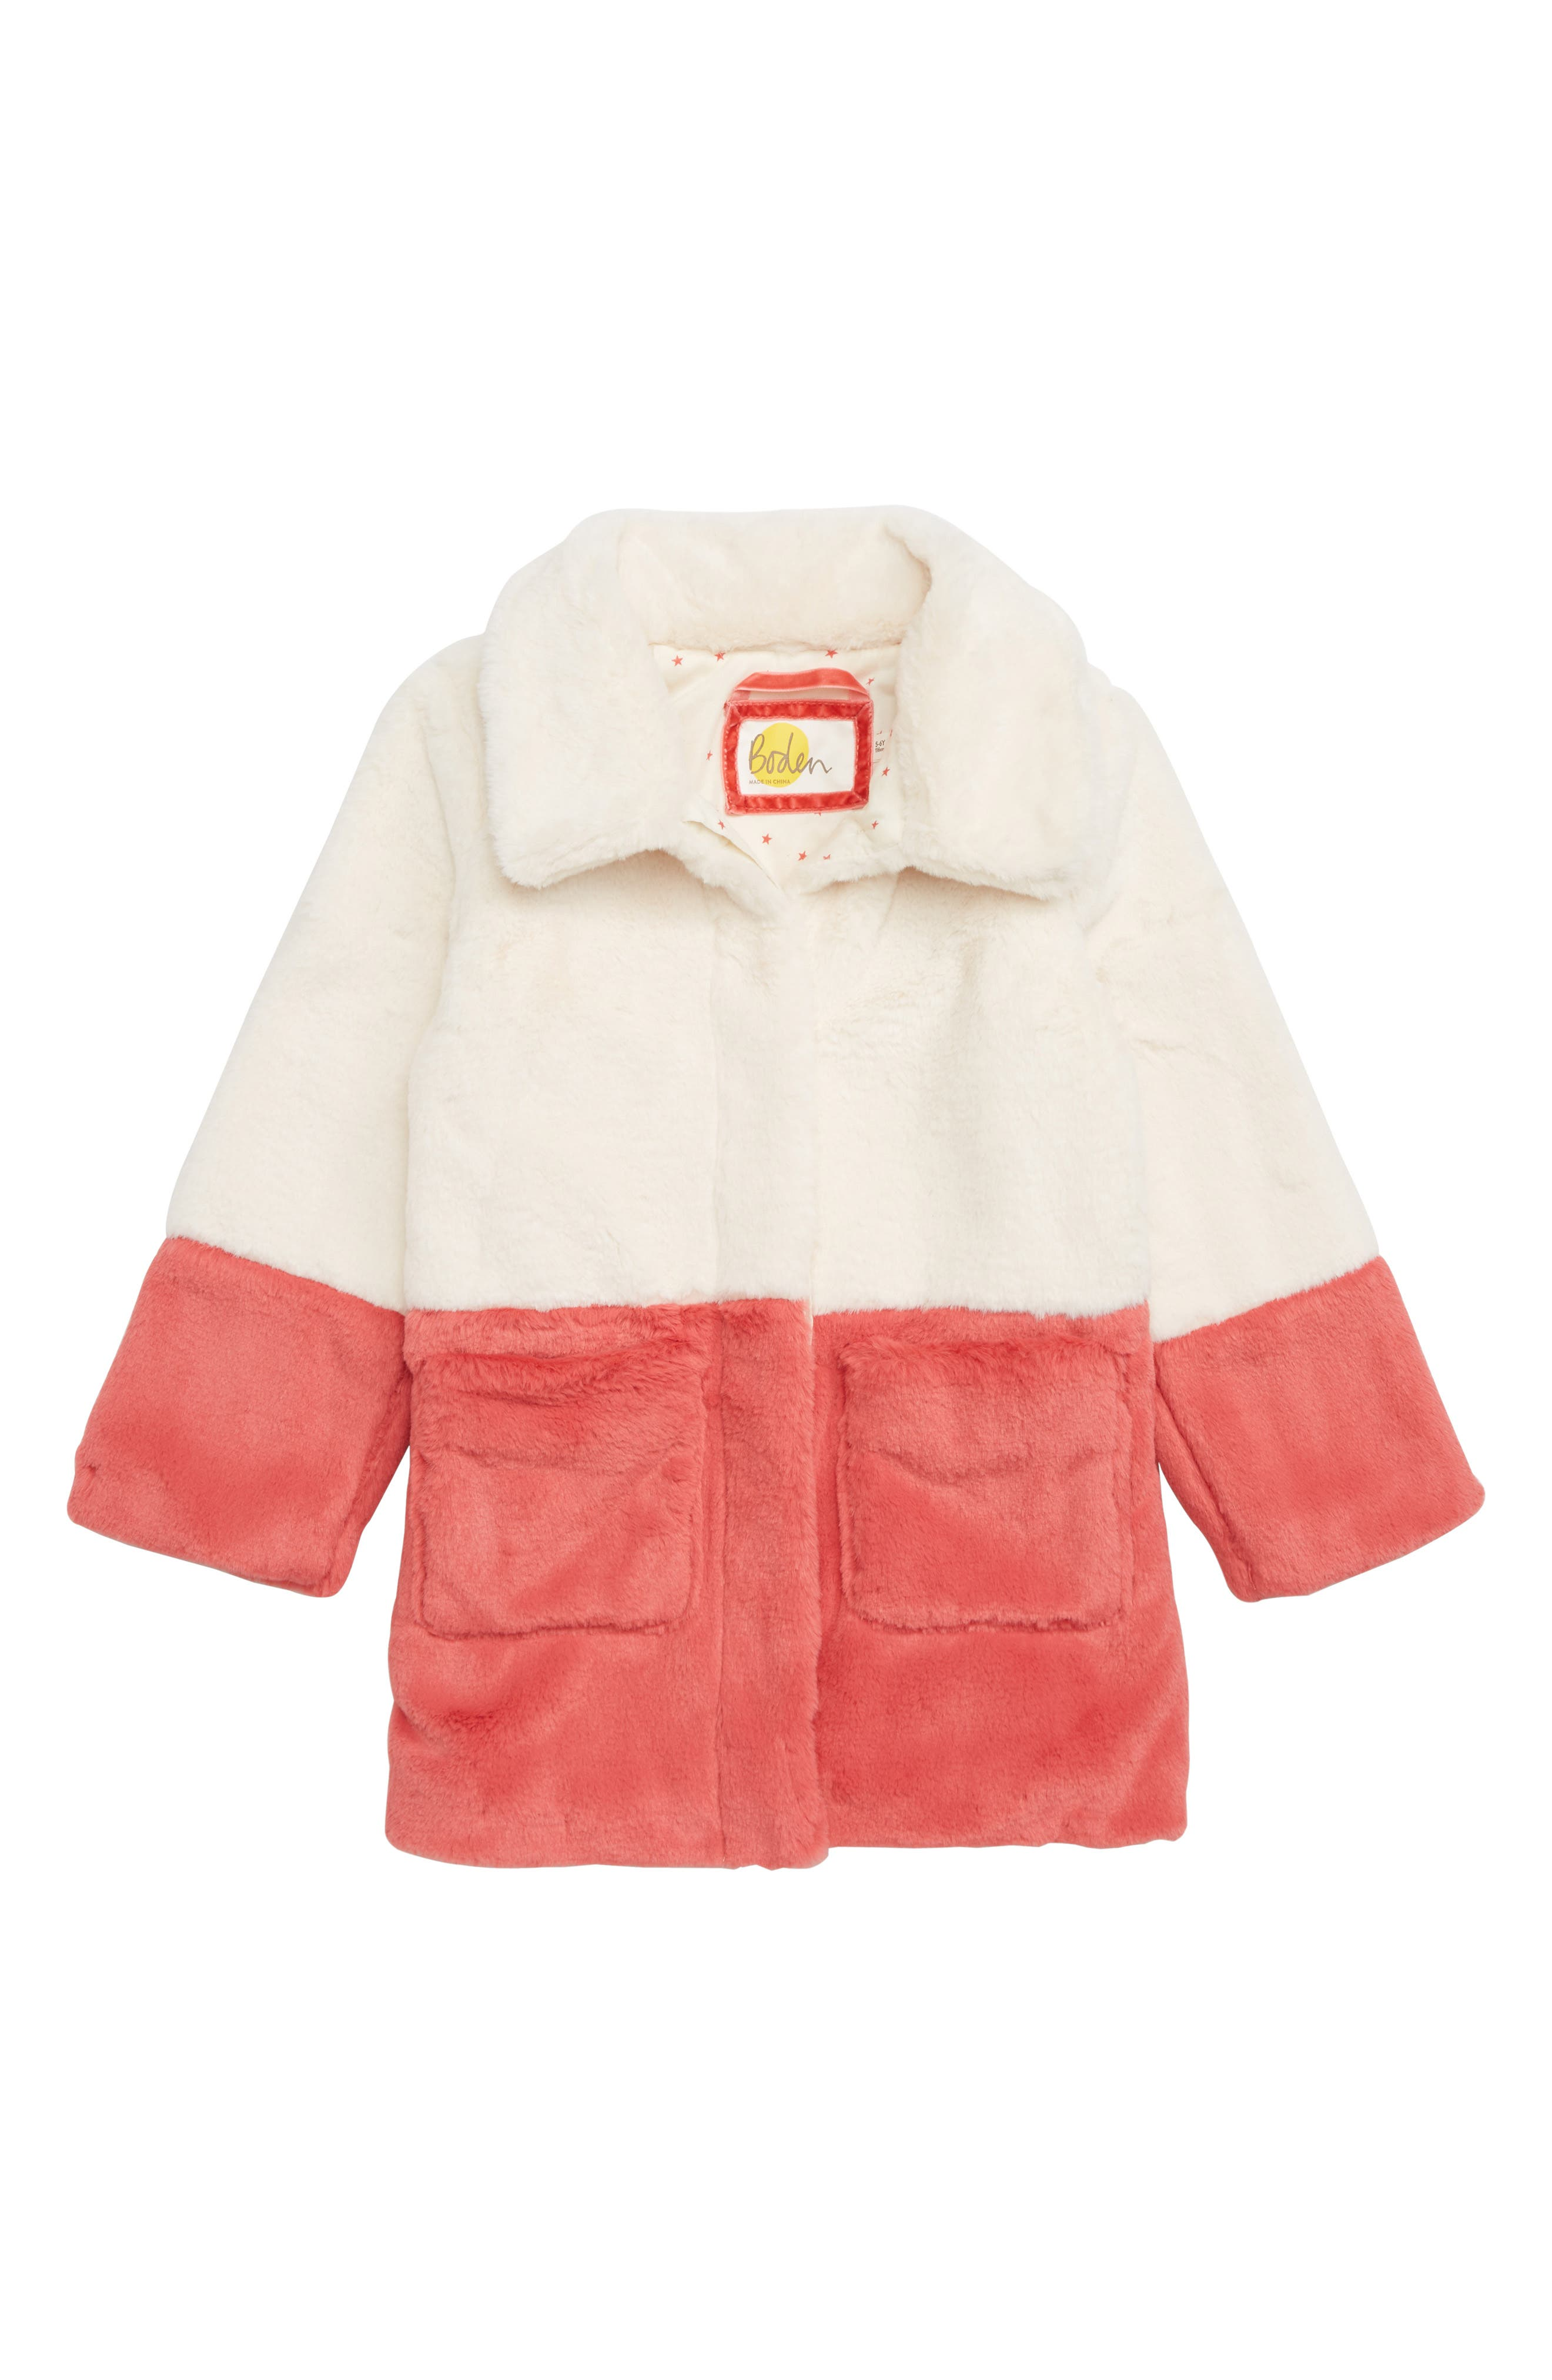 Party Colorblock Faux Fur Coat,                         Main,                         color, ECRU COLOURBLOCK